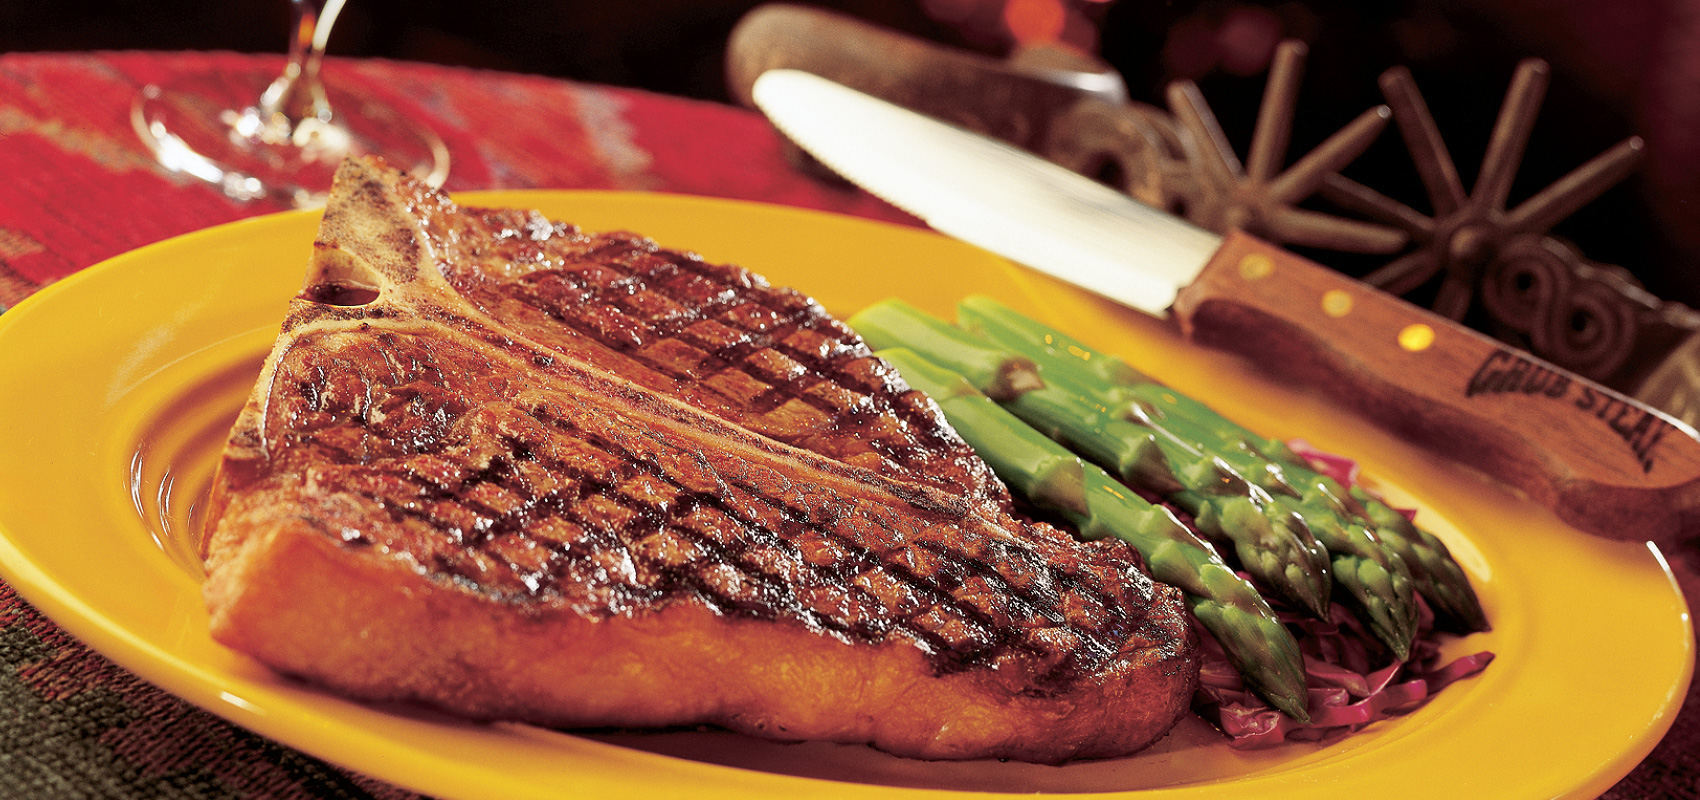 The Best Park City Restaurants for Grilled & BBQ Eats Image